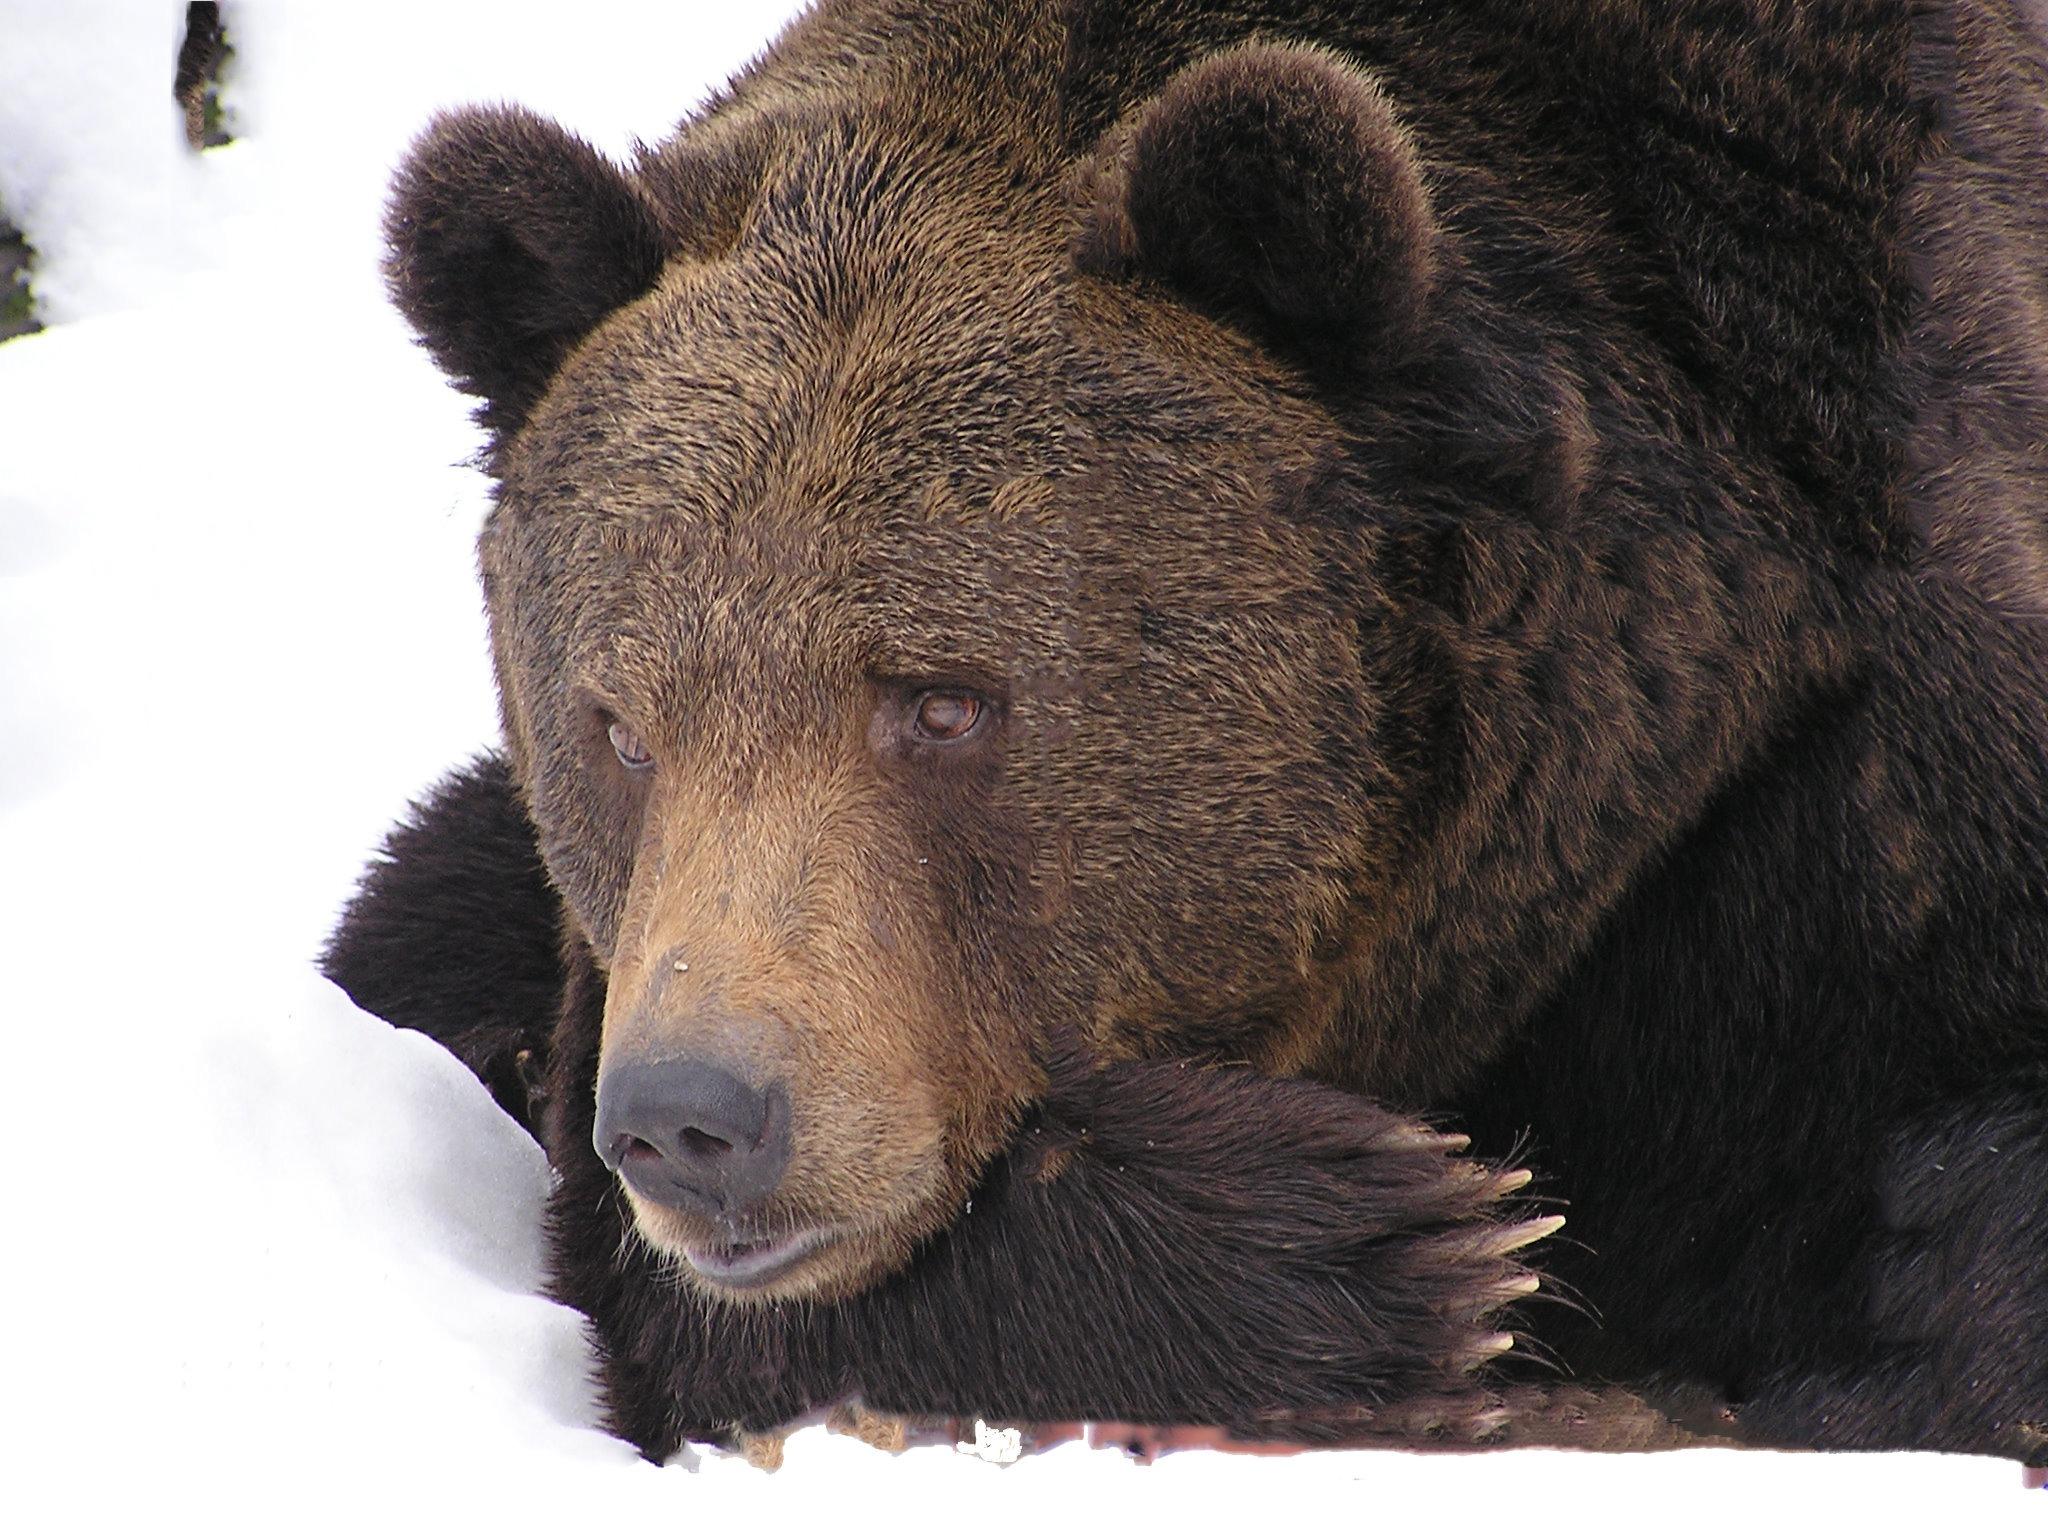 images gratuites la nature neige hiver animal faune. Black Bedroom Furniture Sets. Home Design Ideas